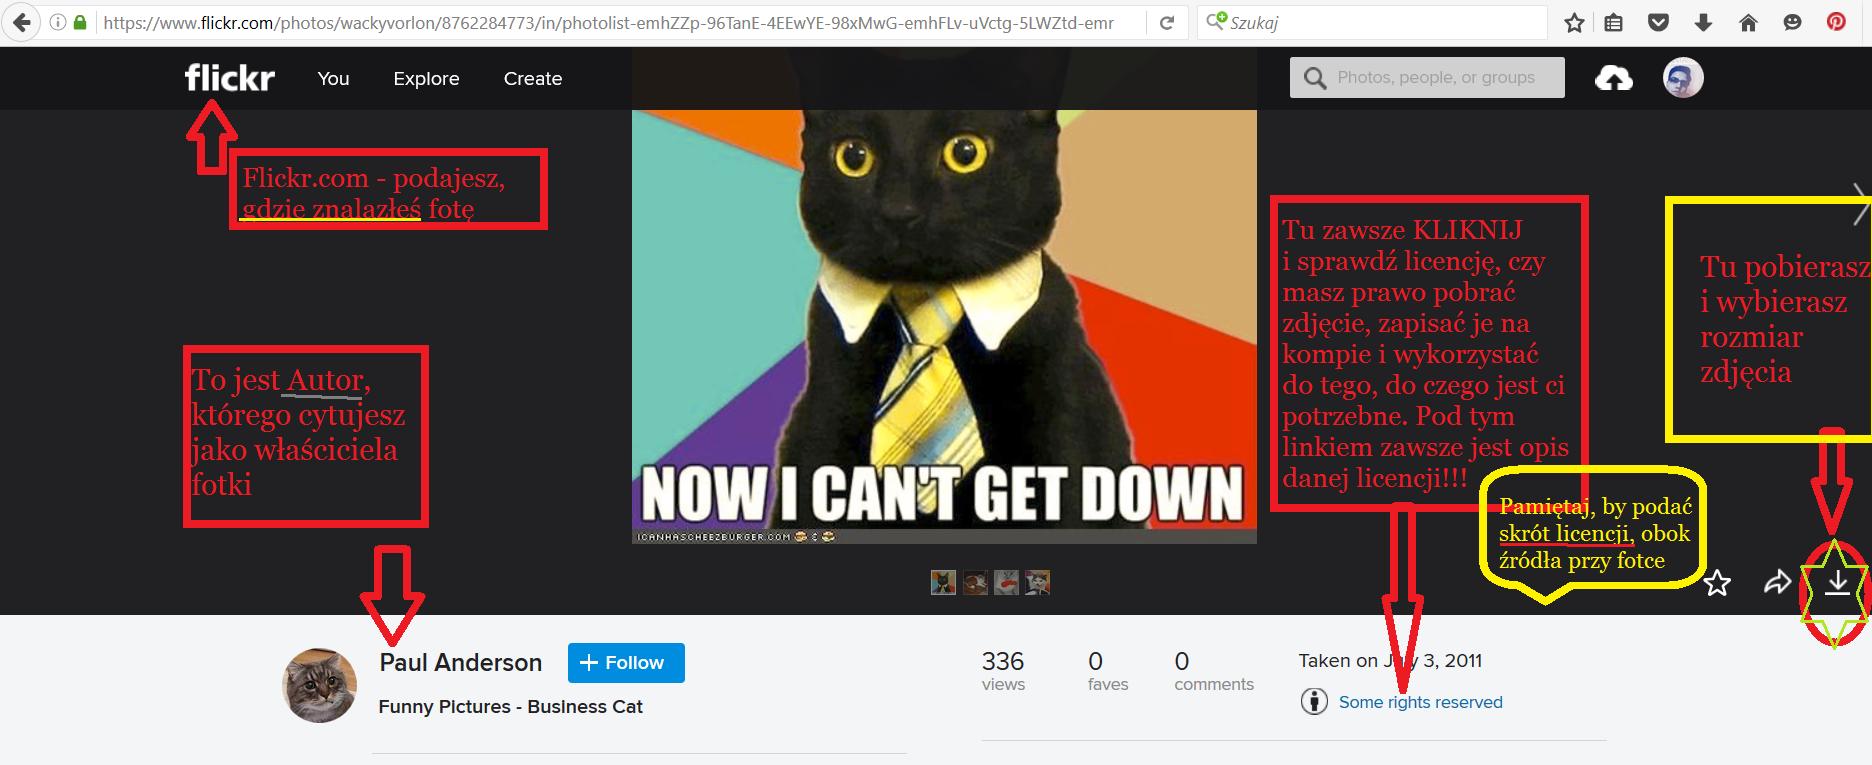 Jak korzystać z Flickr